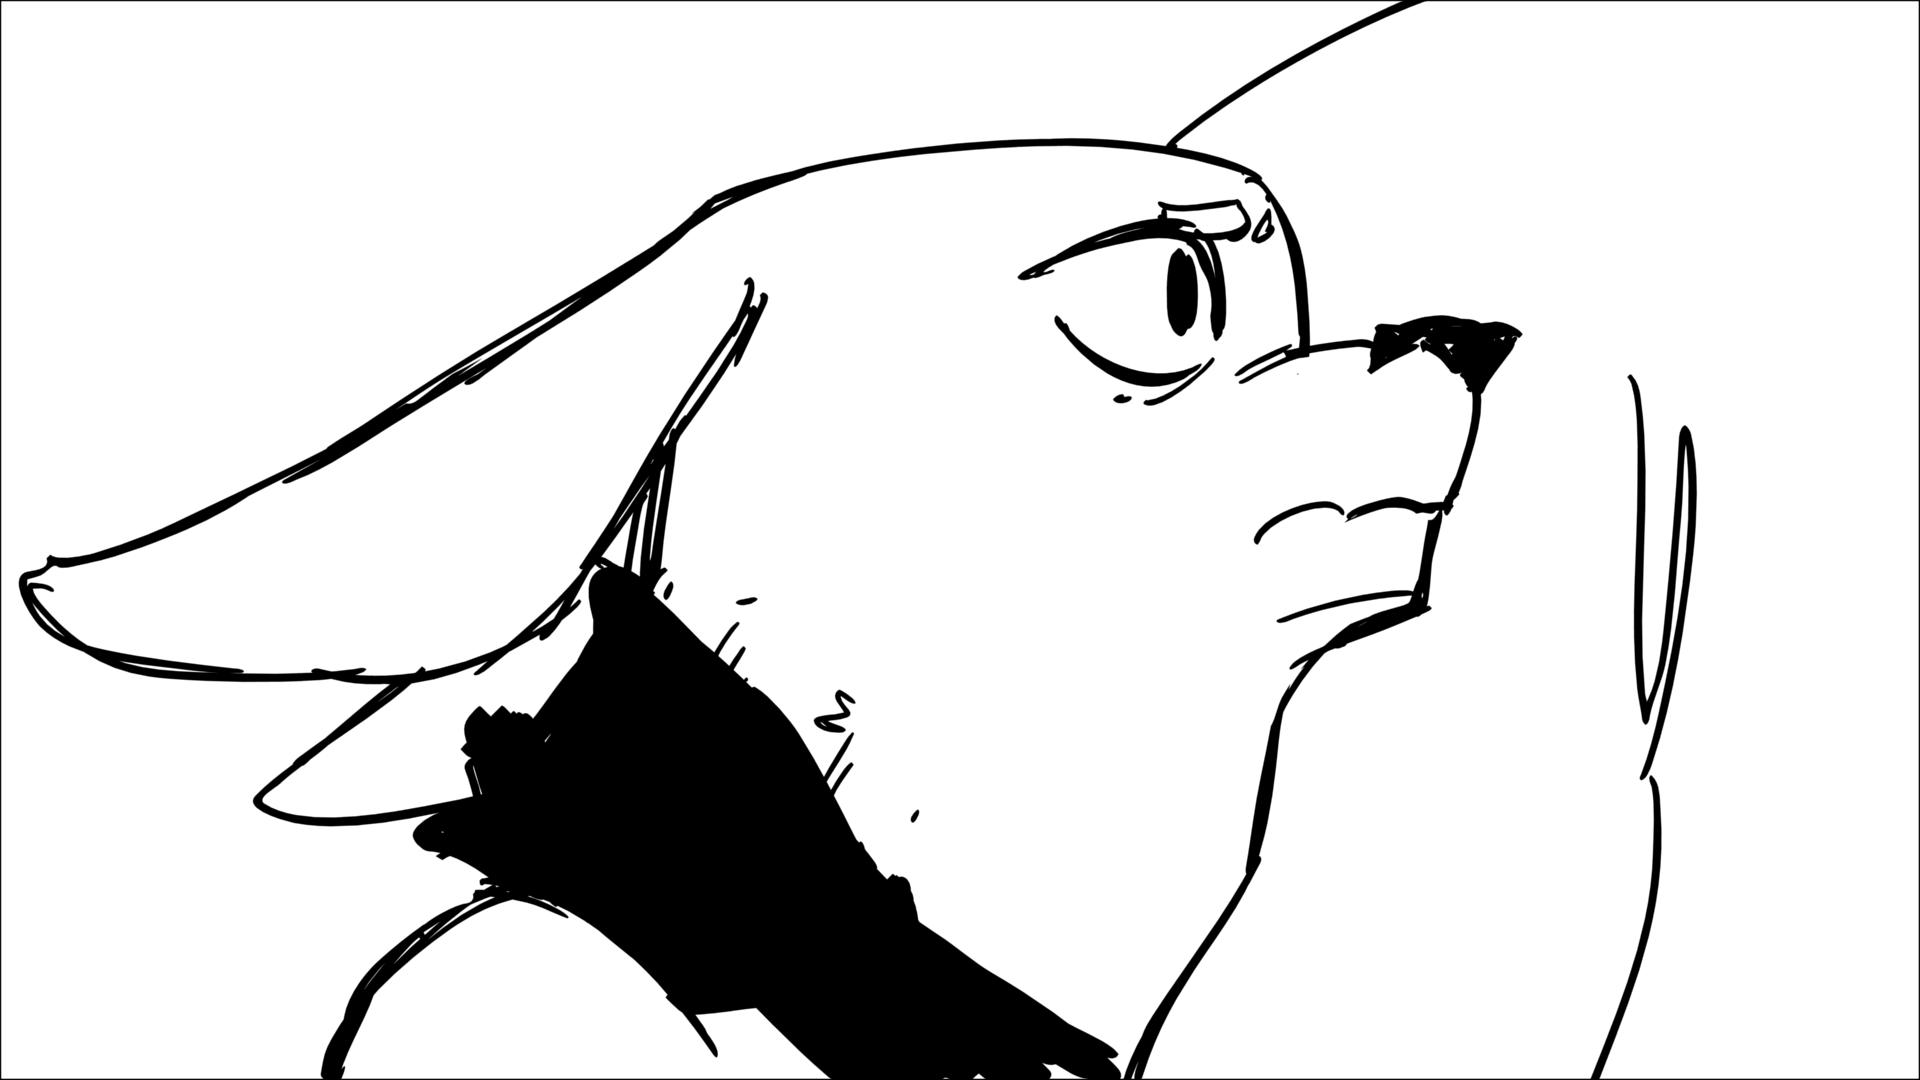 Blades of Furry-000015-02.jpg